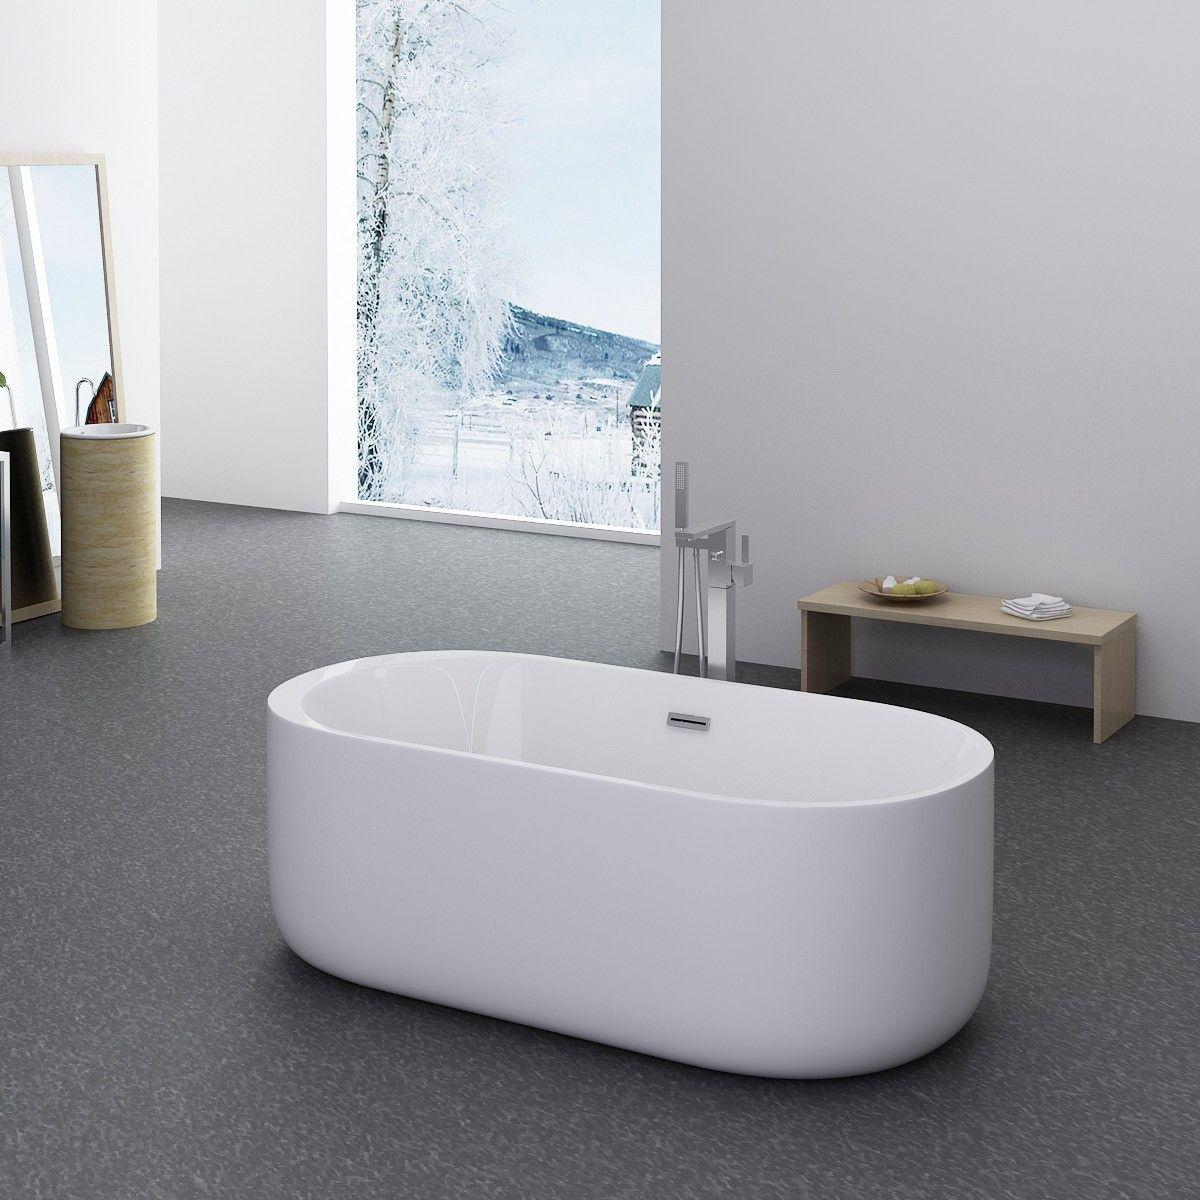 Freistehende Acrylwanne H Lt 701 Wanne Eingebaute Badewanne Badewanne